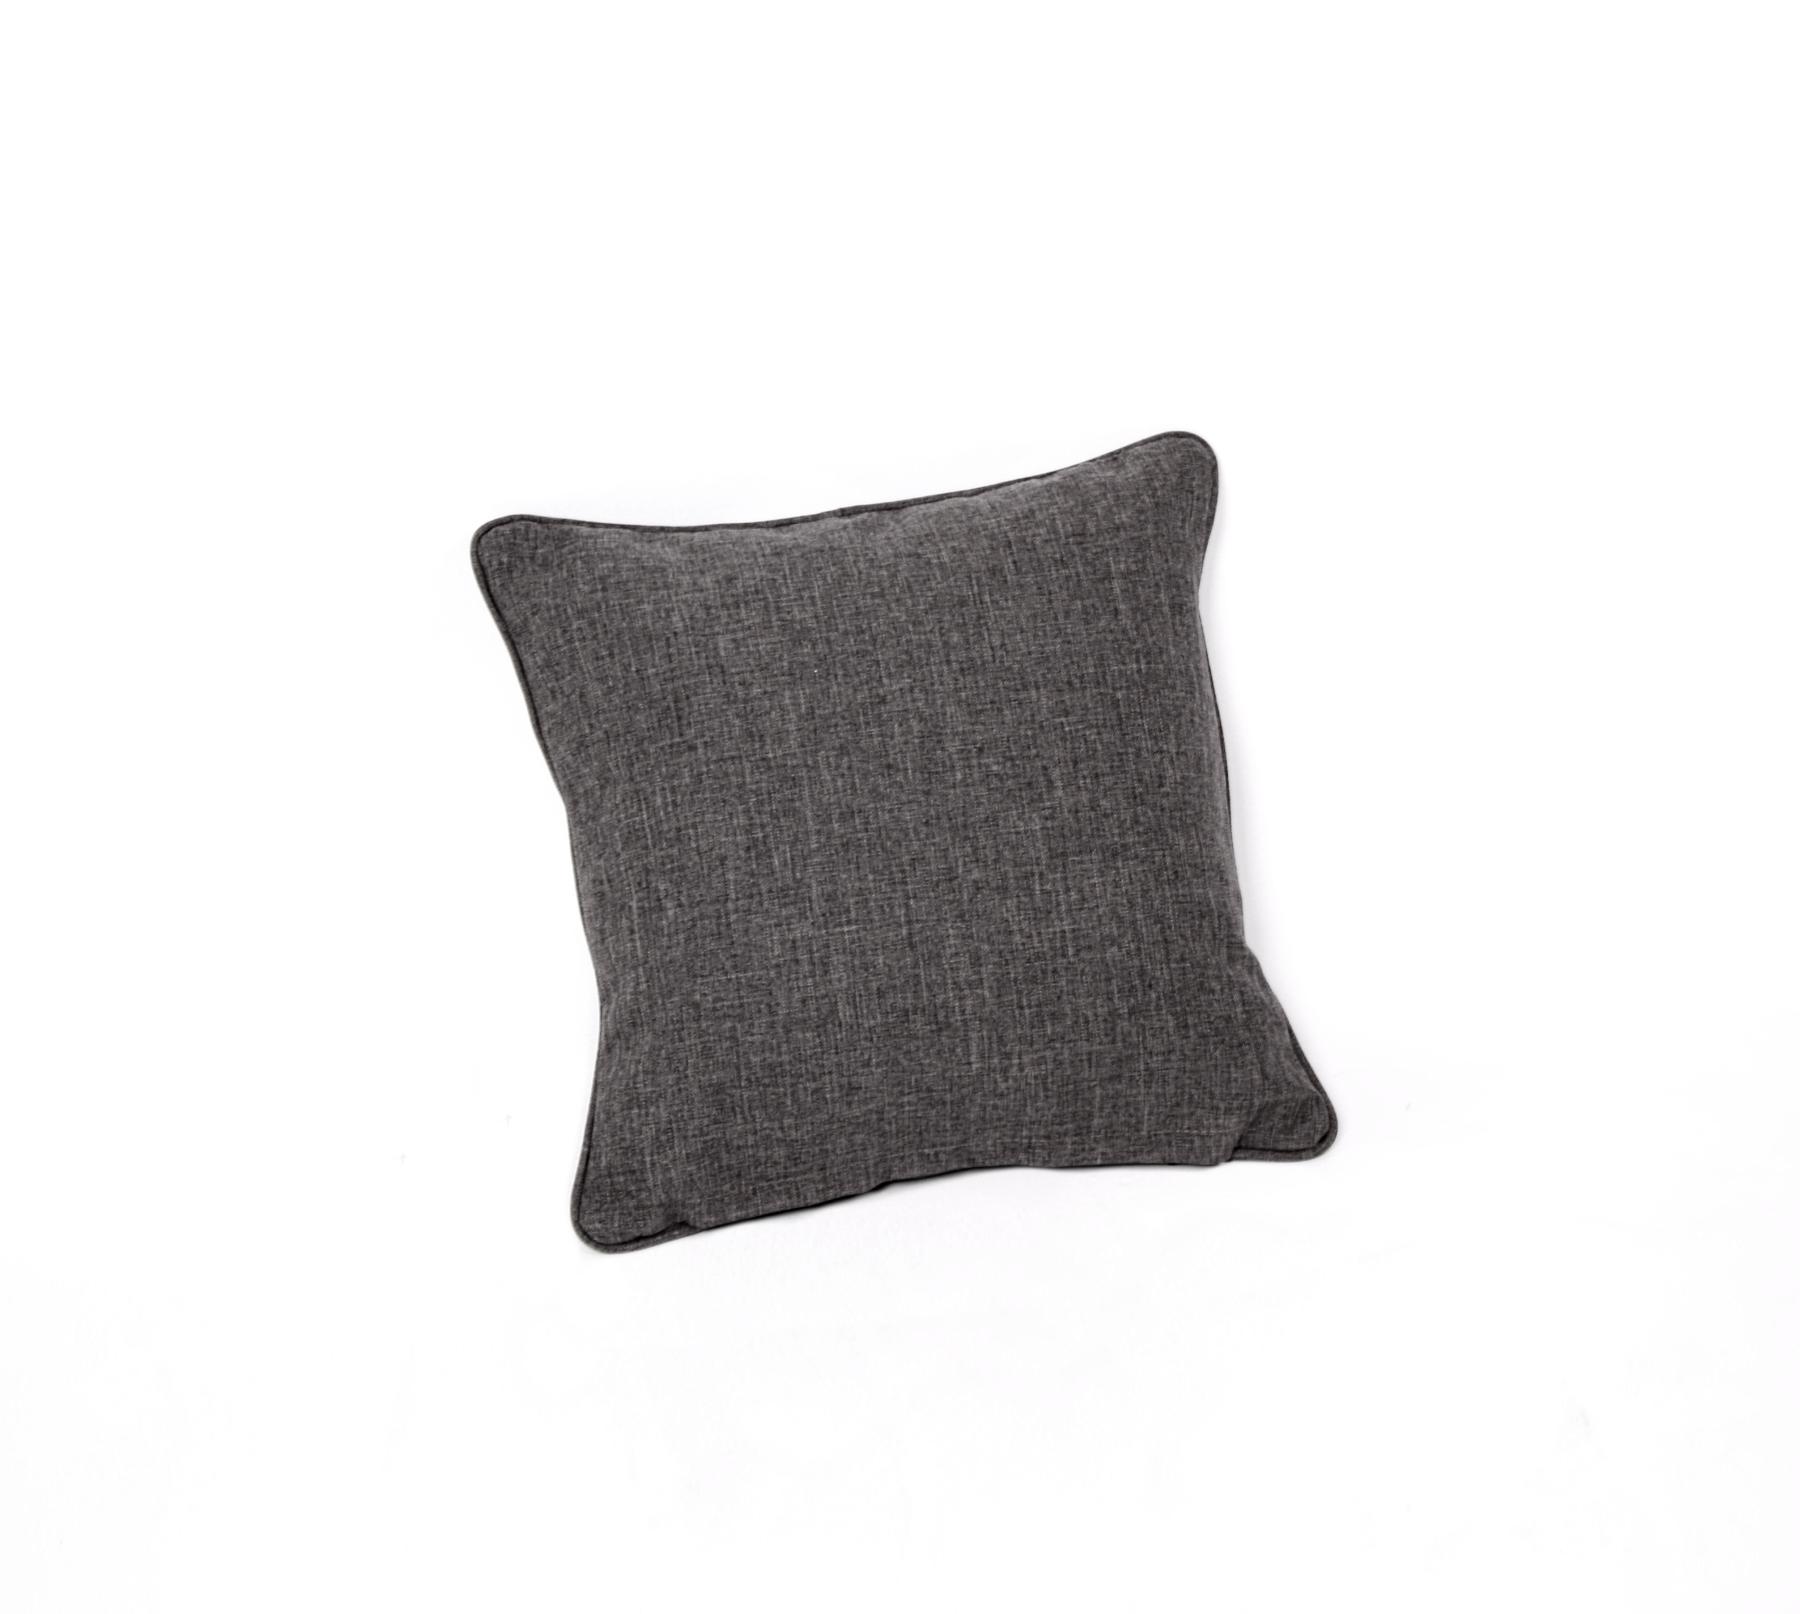 dekokissen savana 40x40 dekokissen savana von supersack. Black Bedroom Furniture Sets. Home Design Ideas